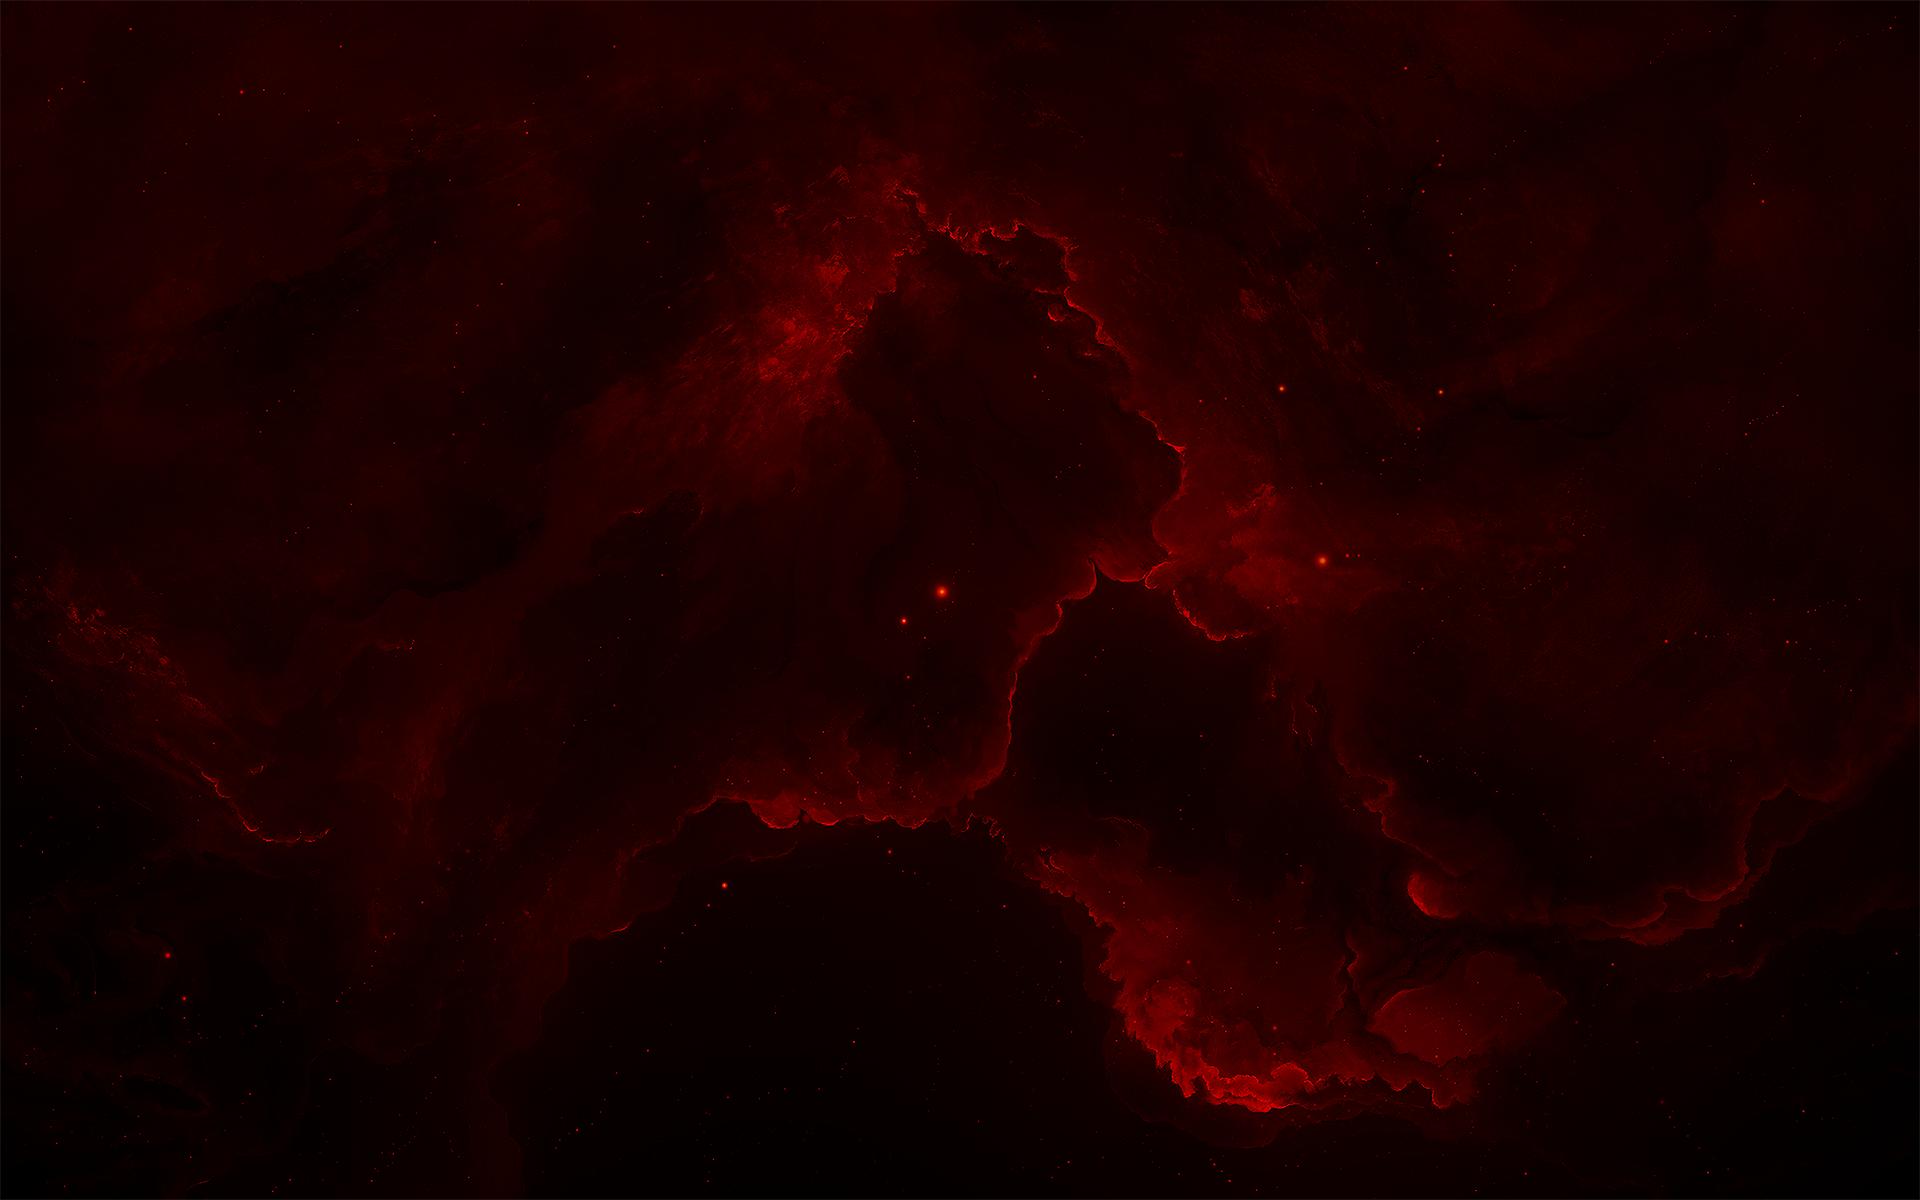 Devil's Lair Nebula